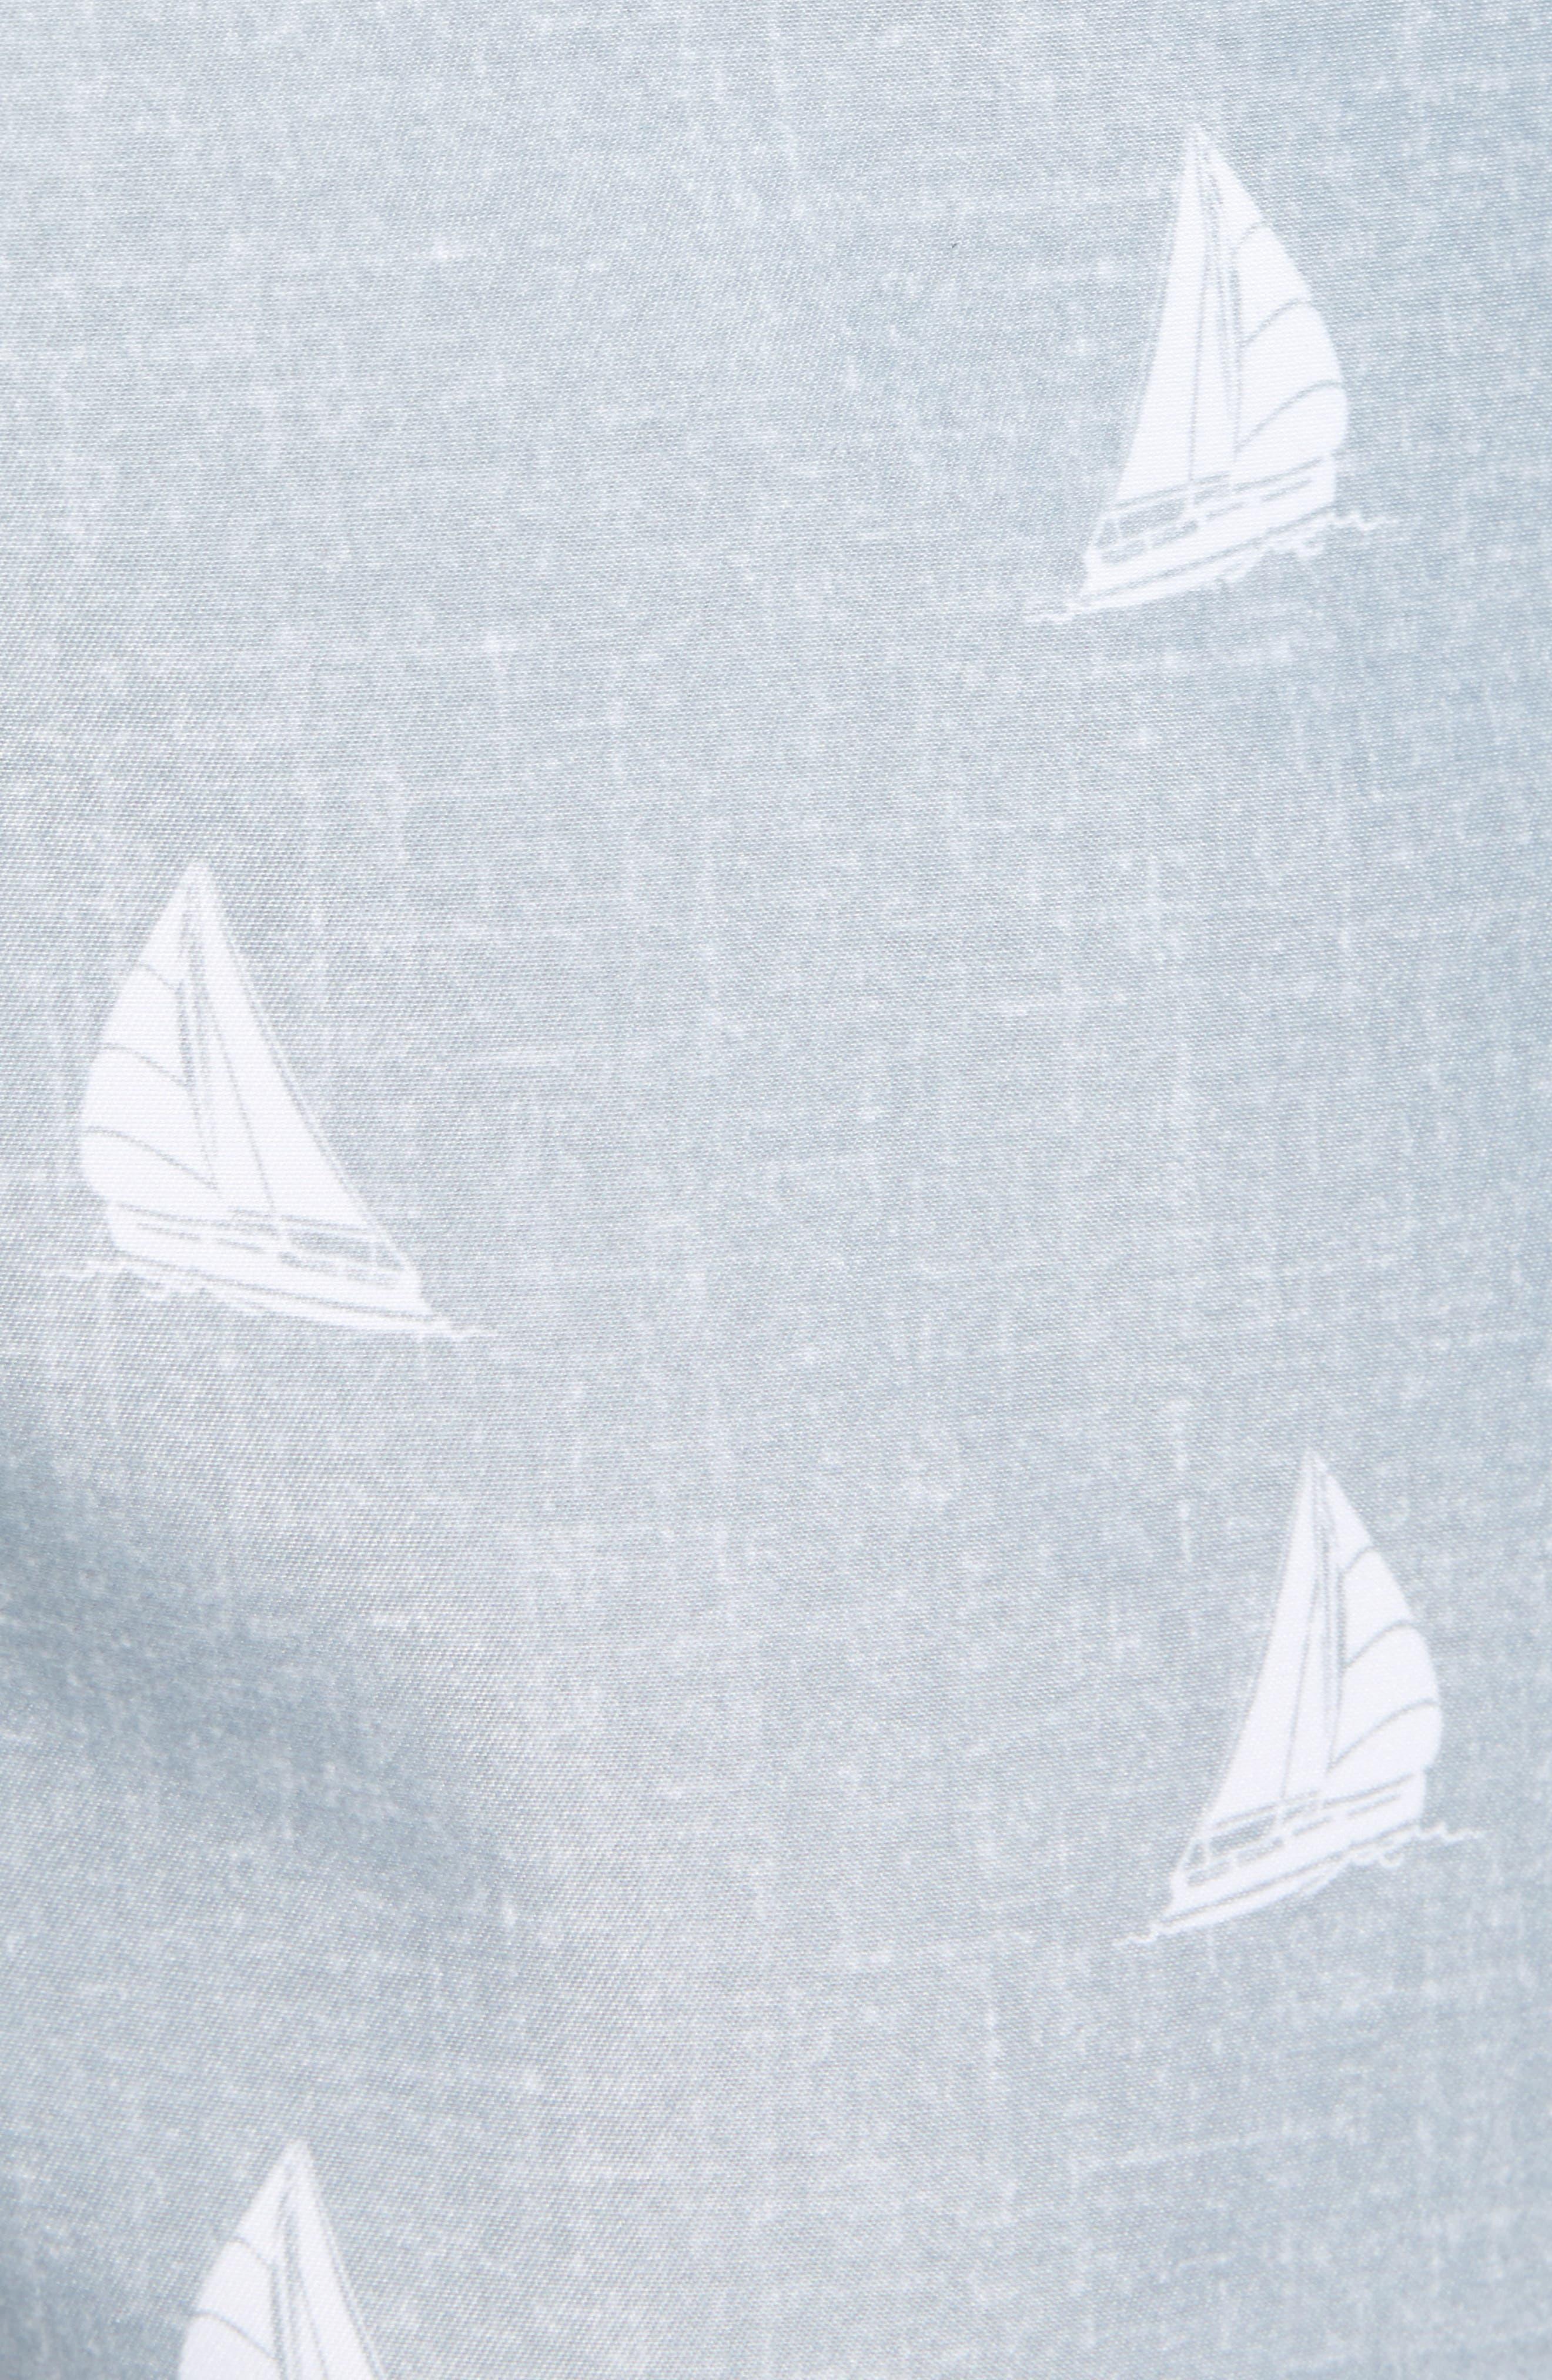 Aruba Slim Fit Swim Trunks,                             Alternate thumbnail 5, color,                             Heathered Grey Sailboats